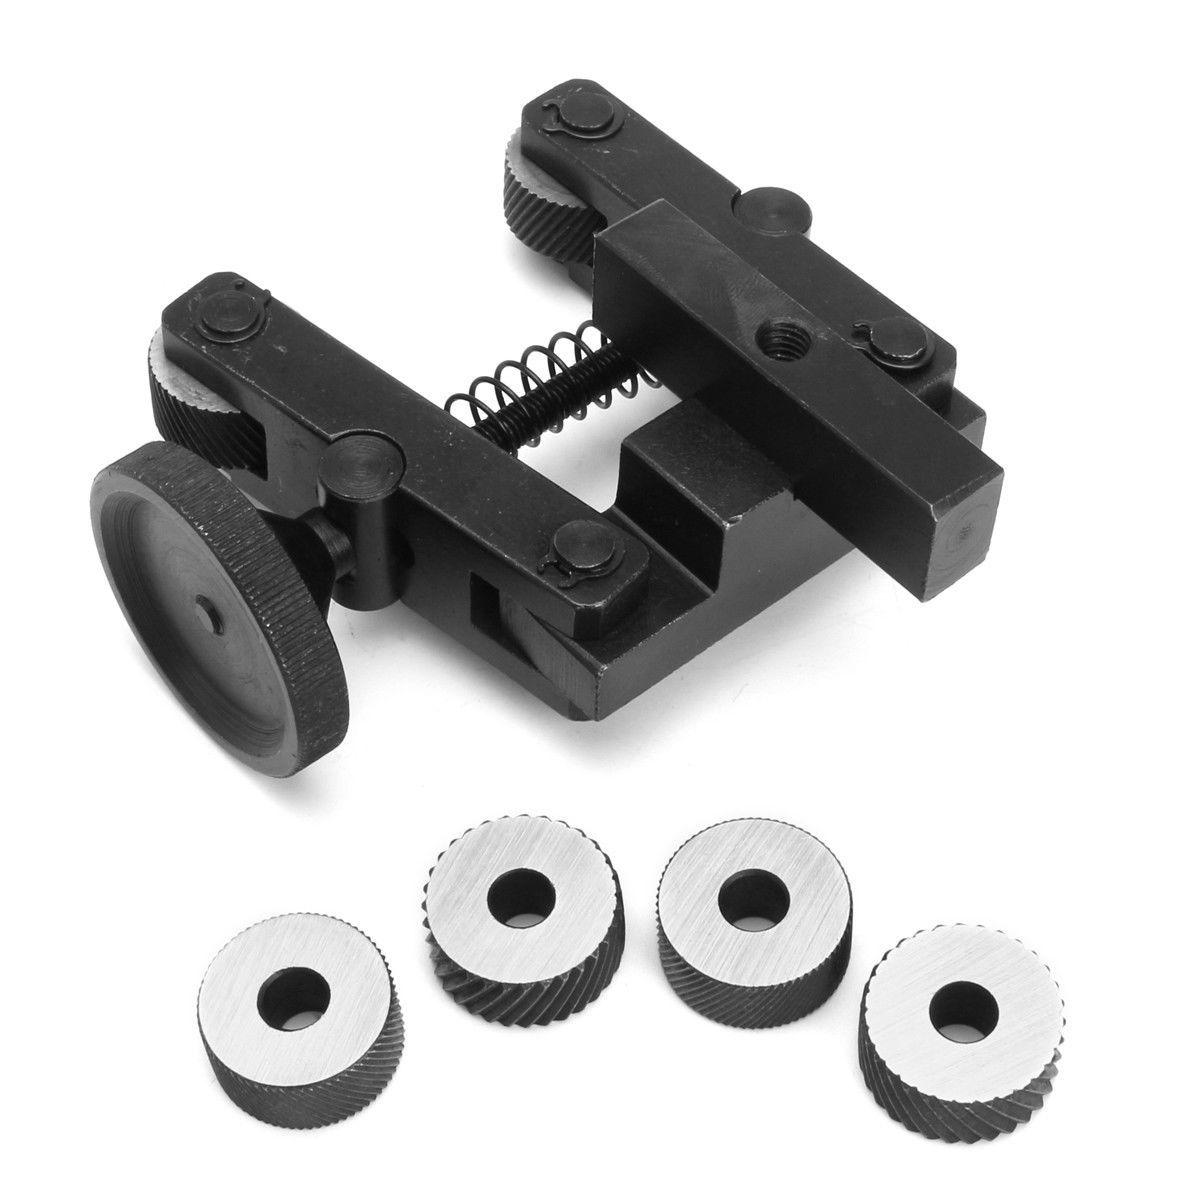 1Set Durable Knurling Tool Holder Linear Knurl Tools Lathe Adjustable Shank + 6pcs CR15 Wheels For Lathe Spindle Bearings